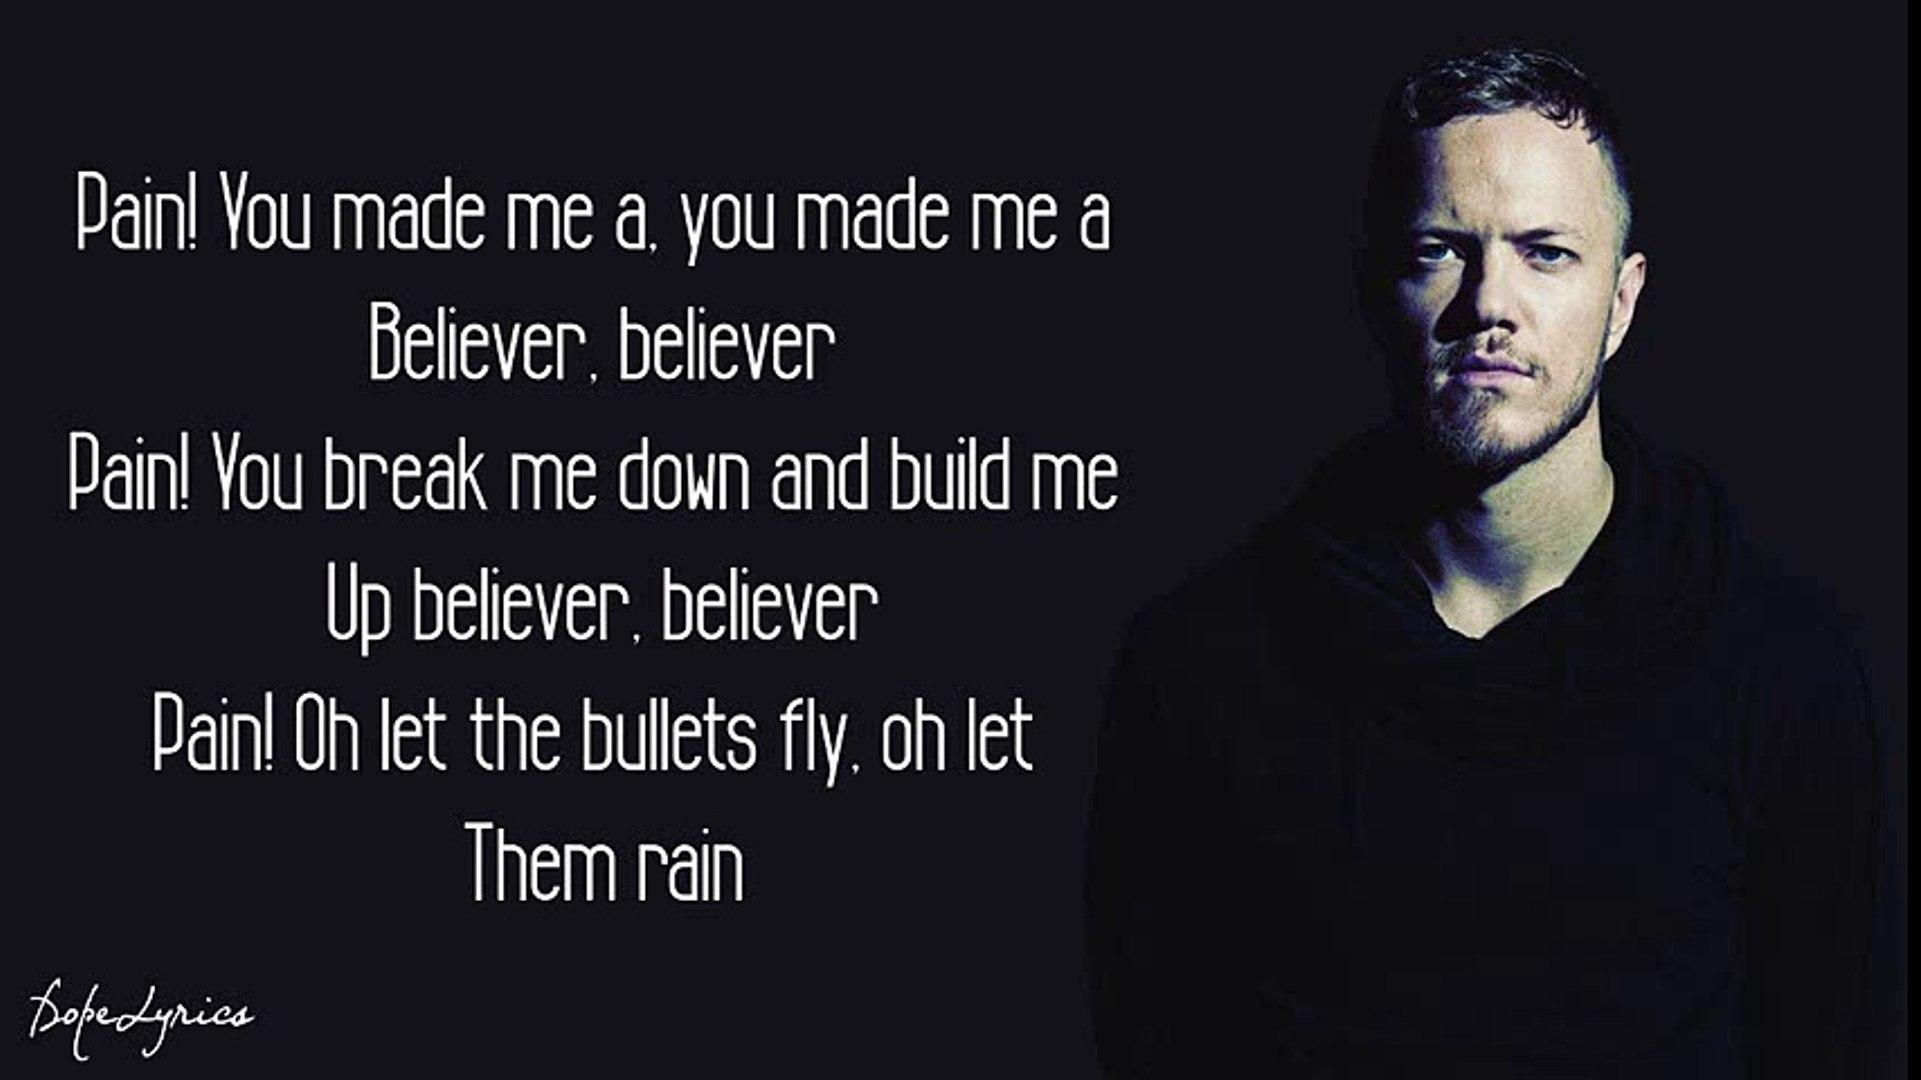 Believer - Imagine Dragons (Lyrics)